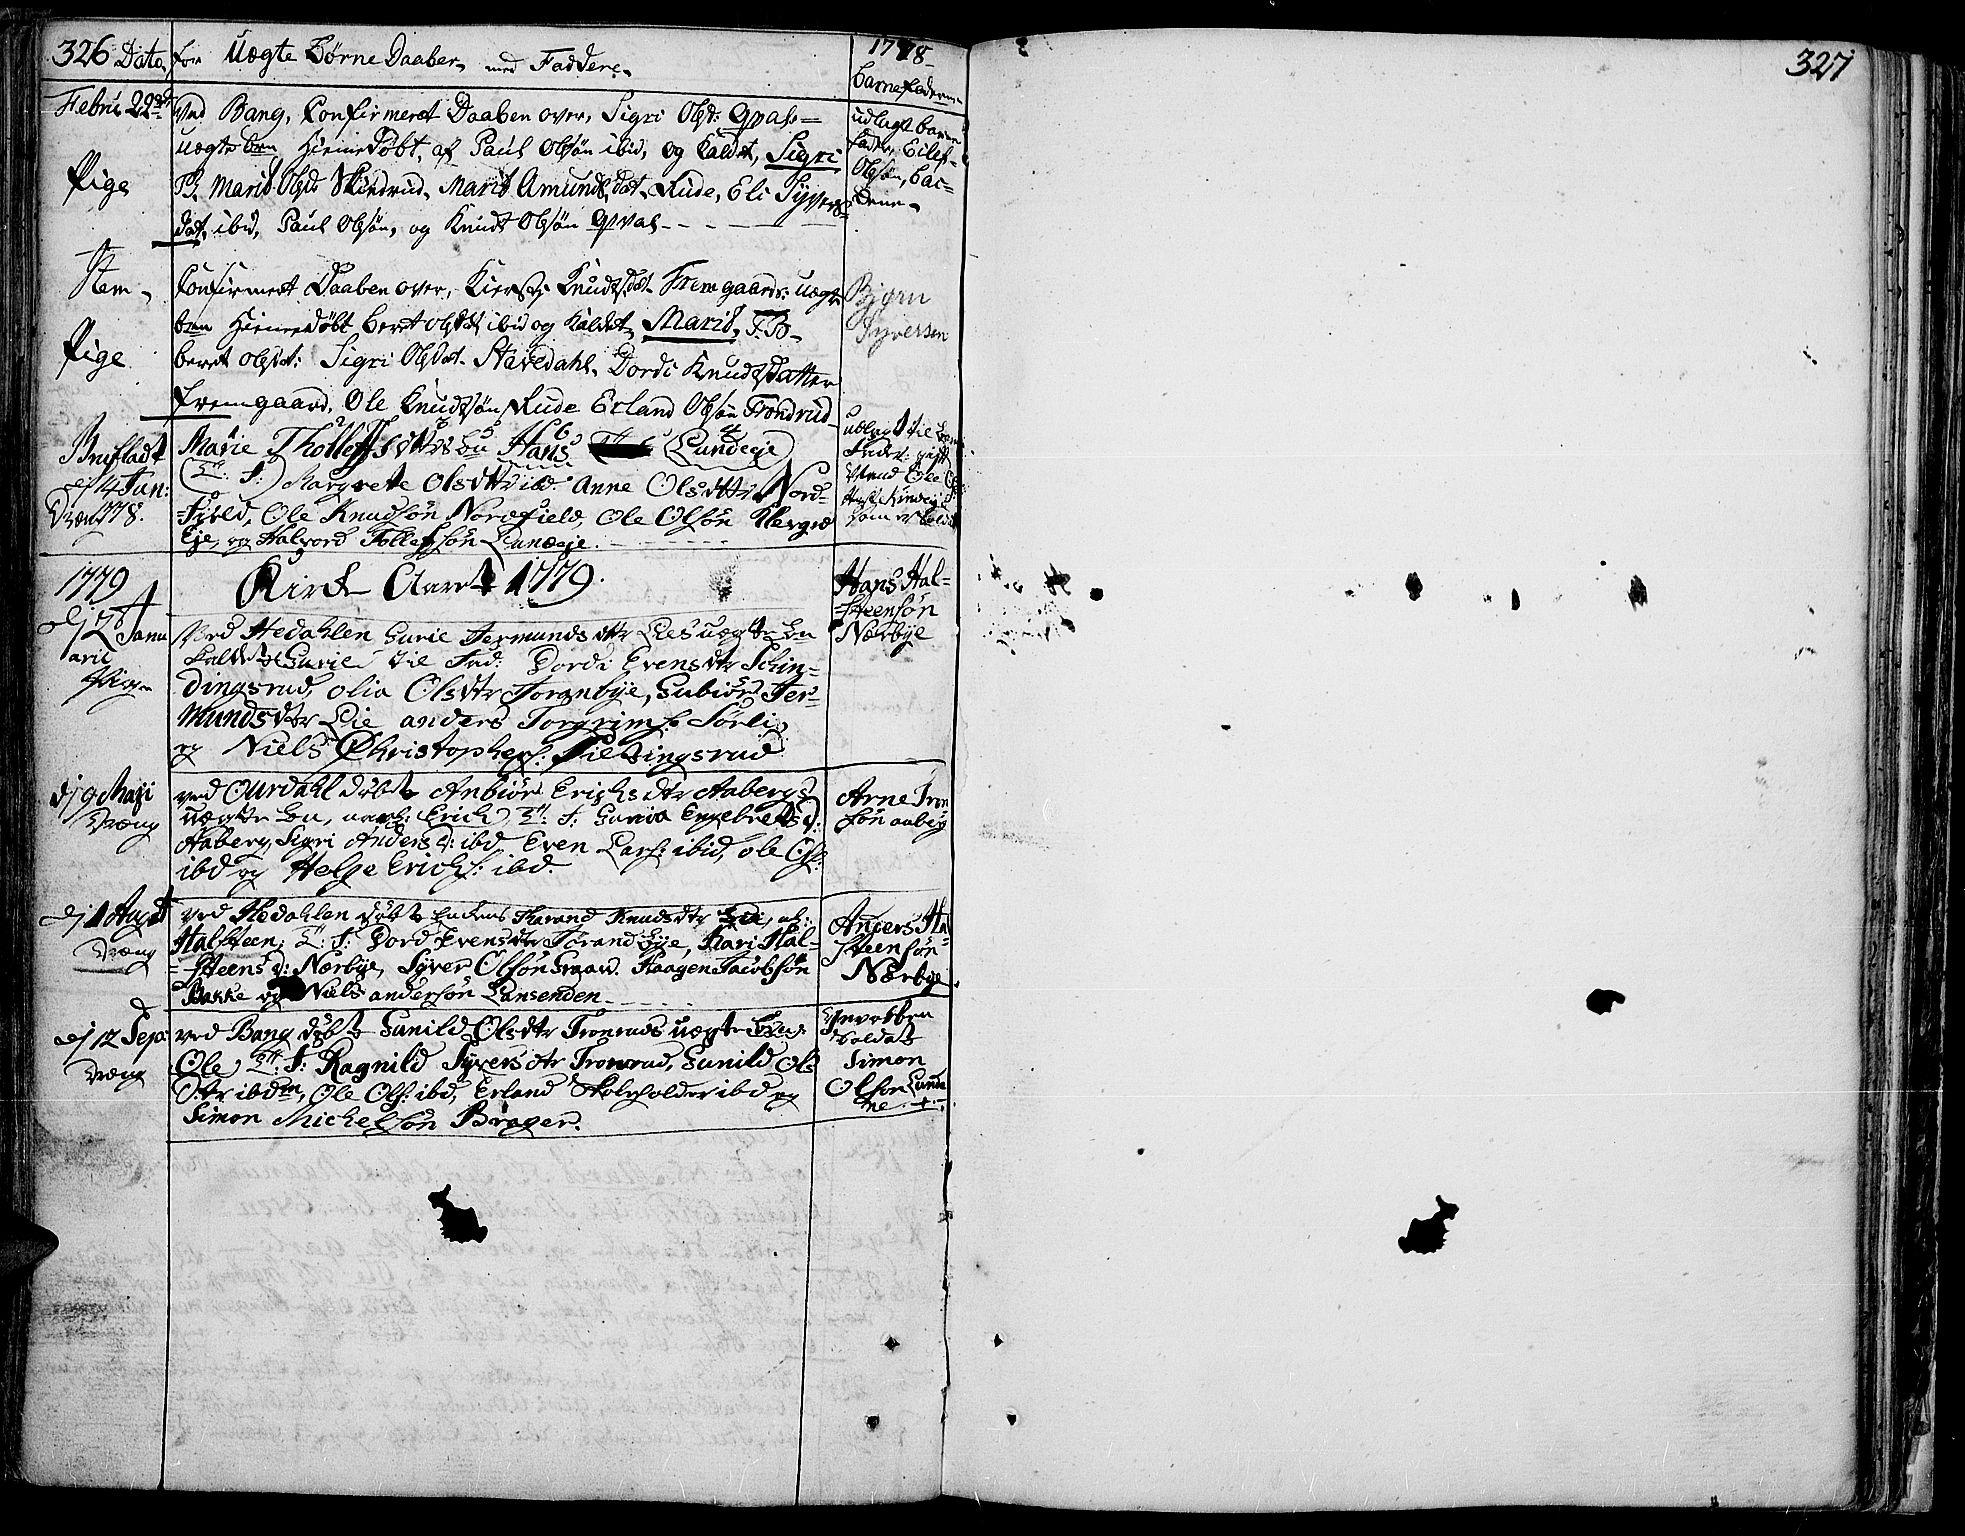 SAH, Aurdal prestekontor, Ministerialbok nr. 5, 1763-1781, s. 326-327